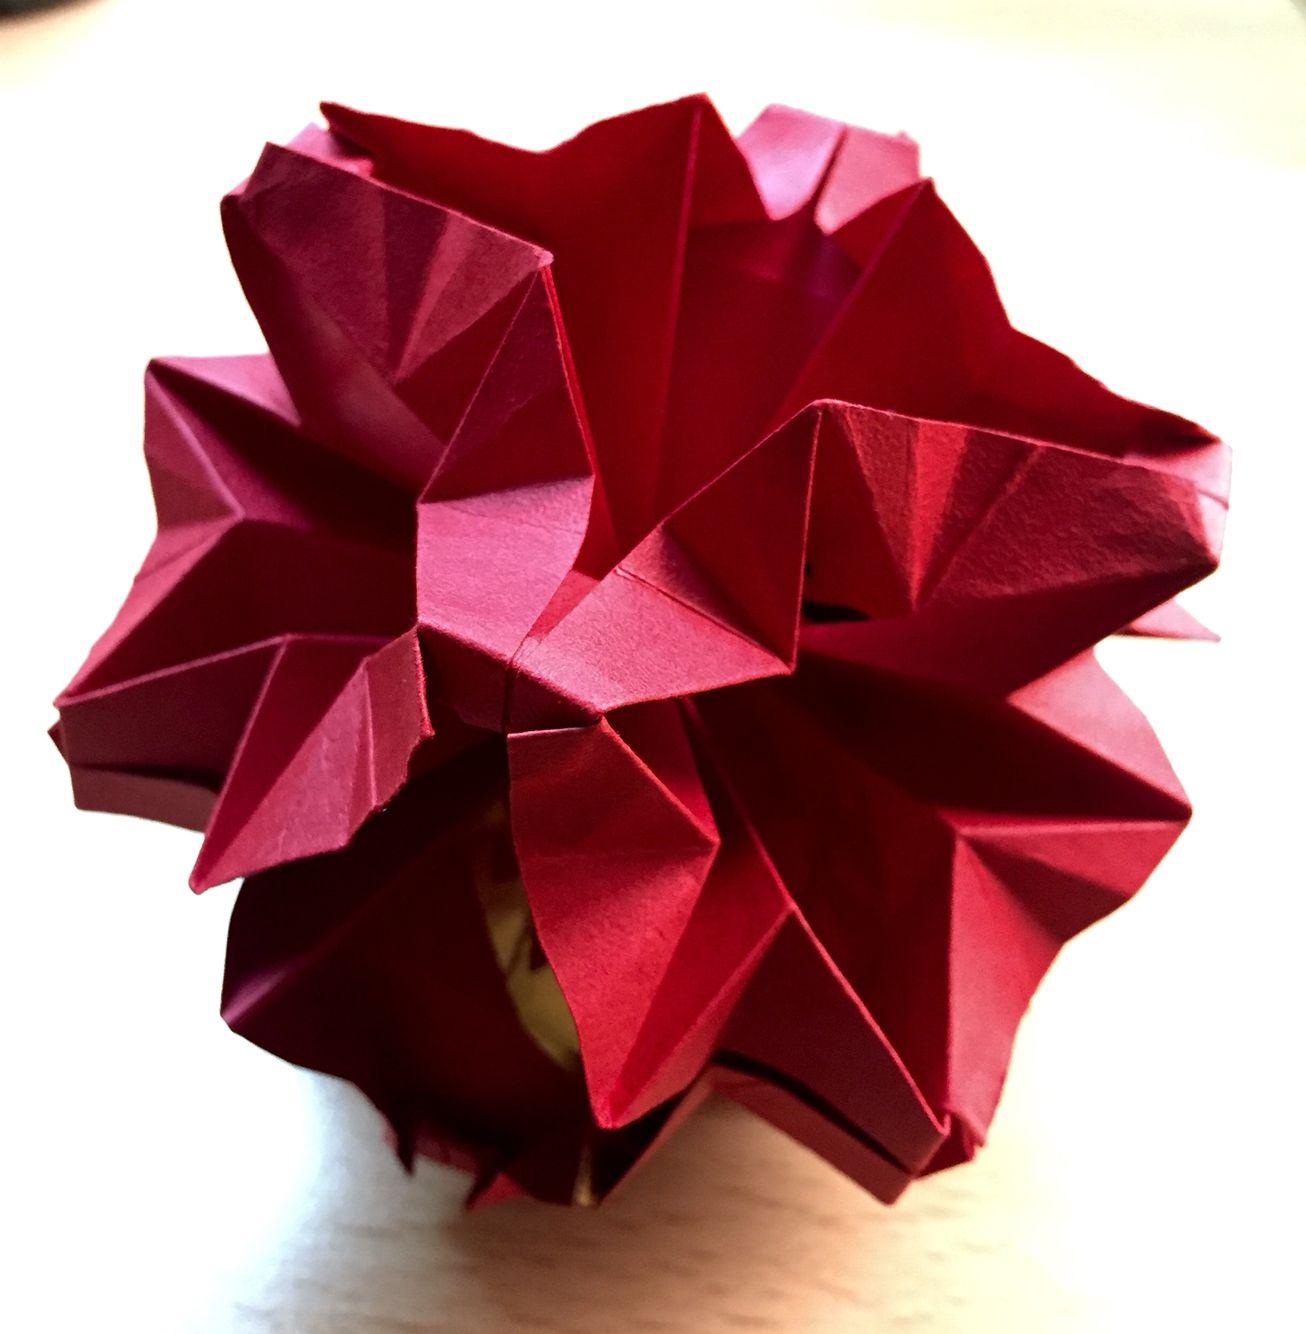 Origami Flower Ball Origami Pinterest Origami Origami Flowers